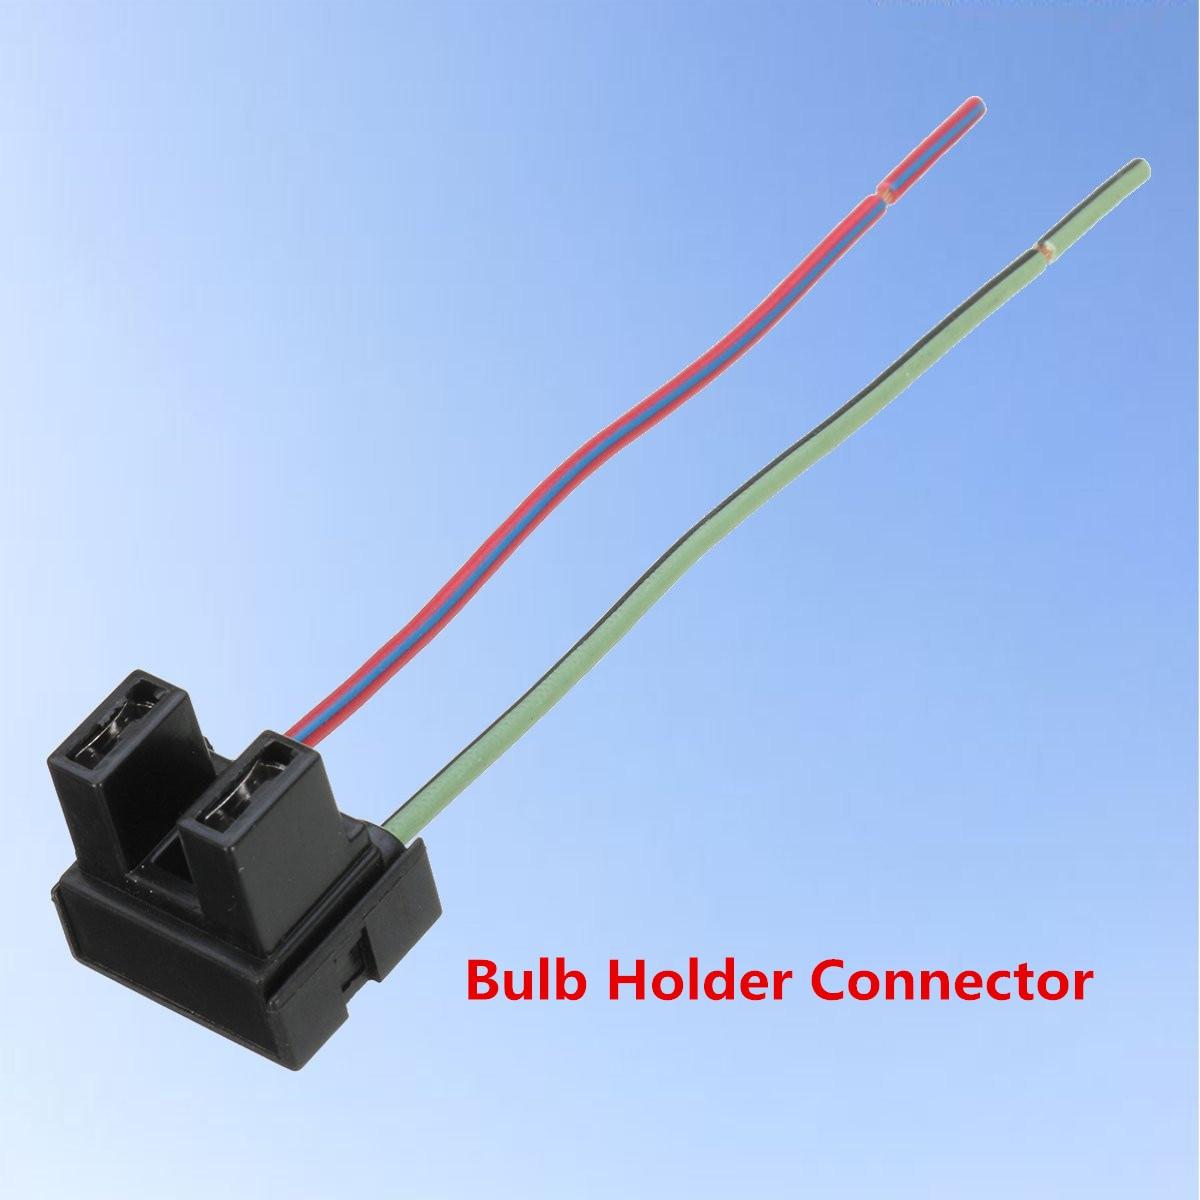 1pcs H7 2 Pin Headlight Replacement Repair Bulb Holder